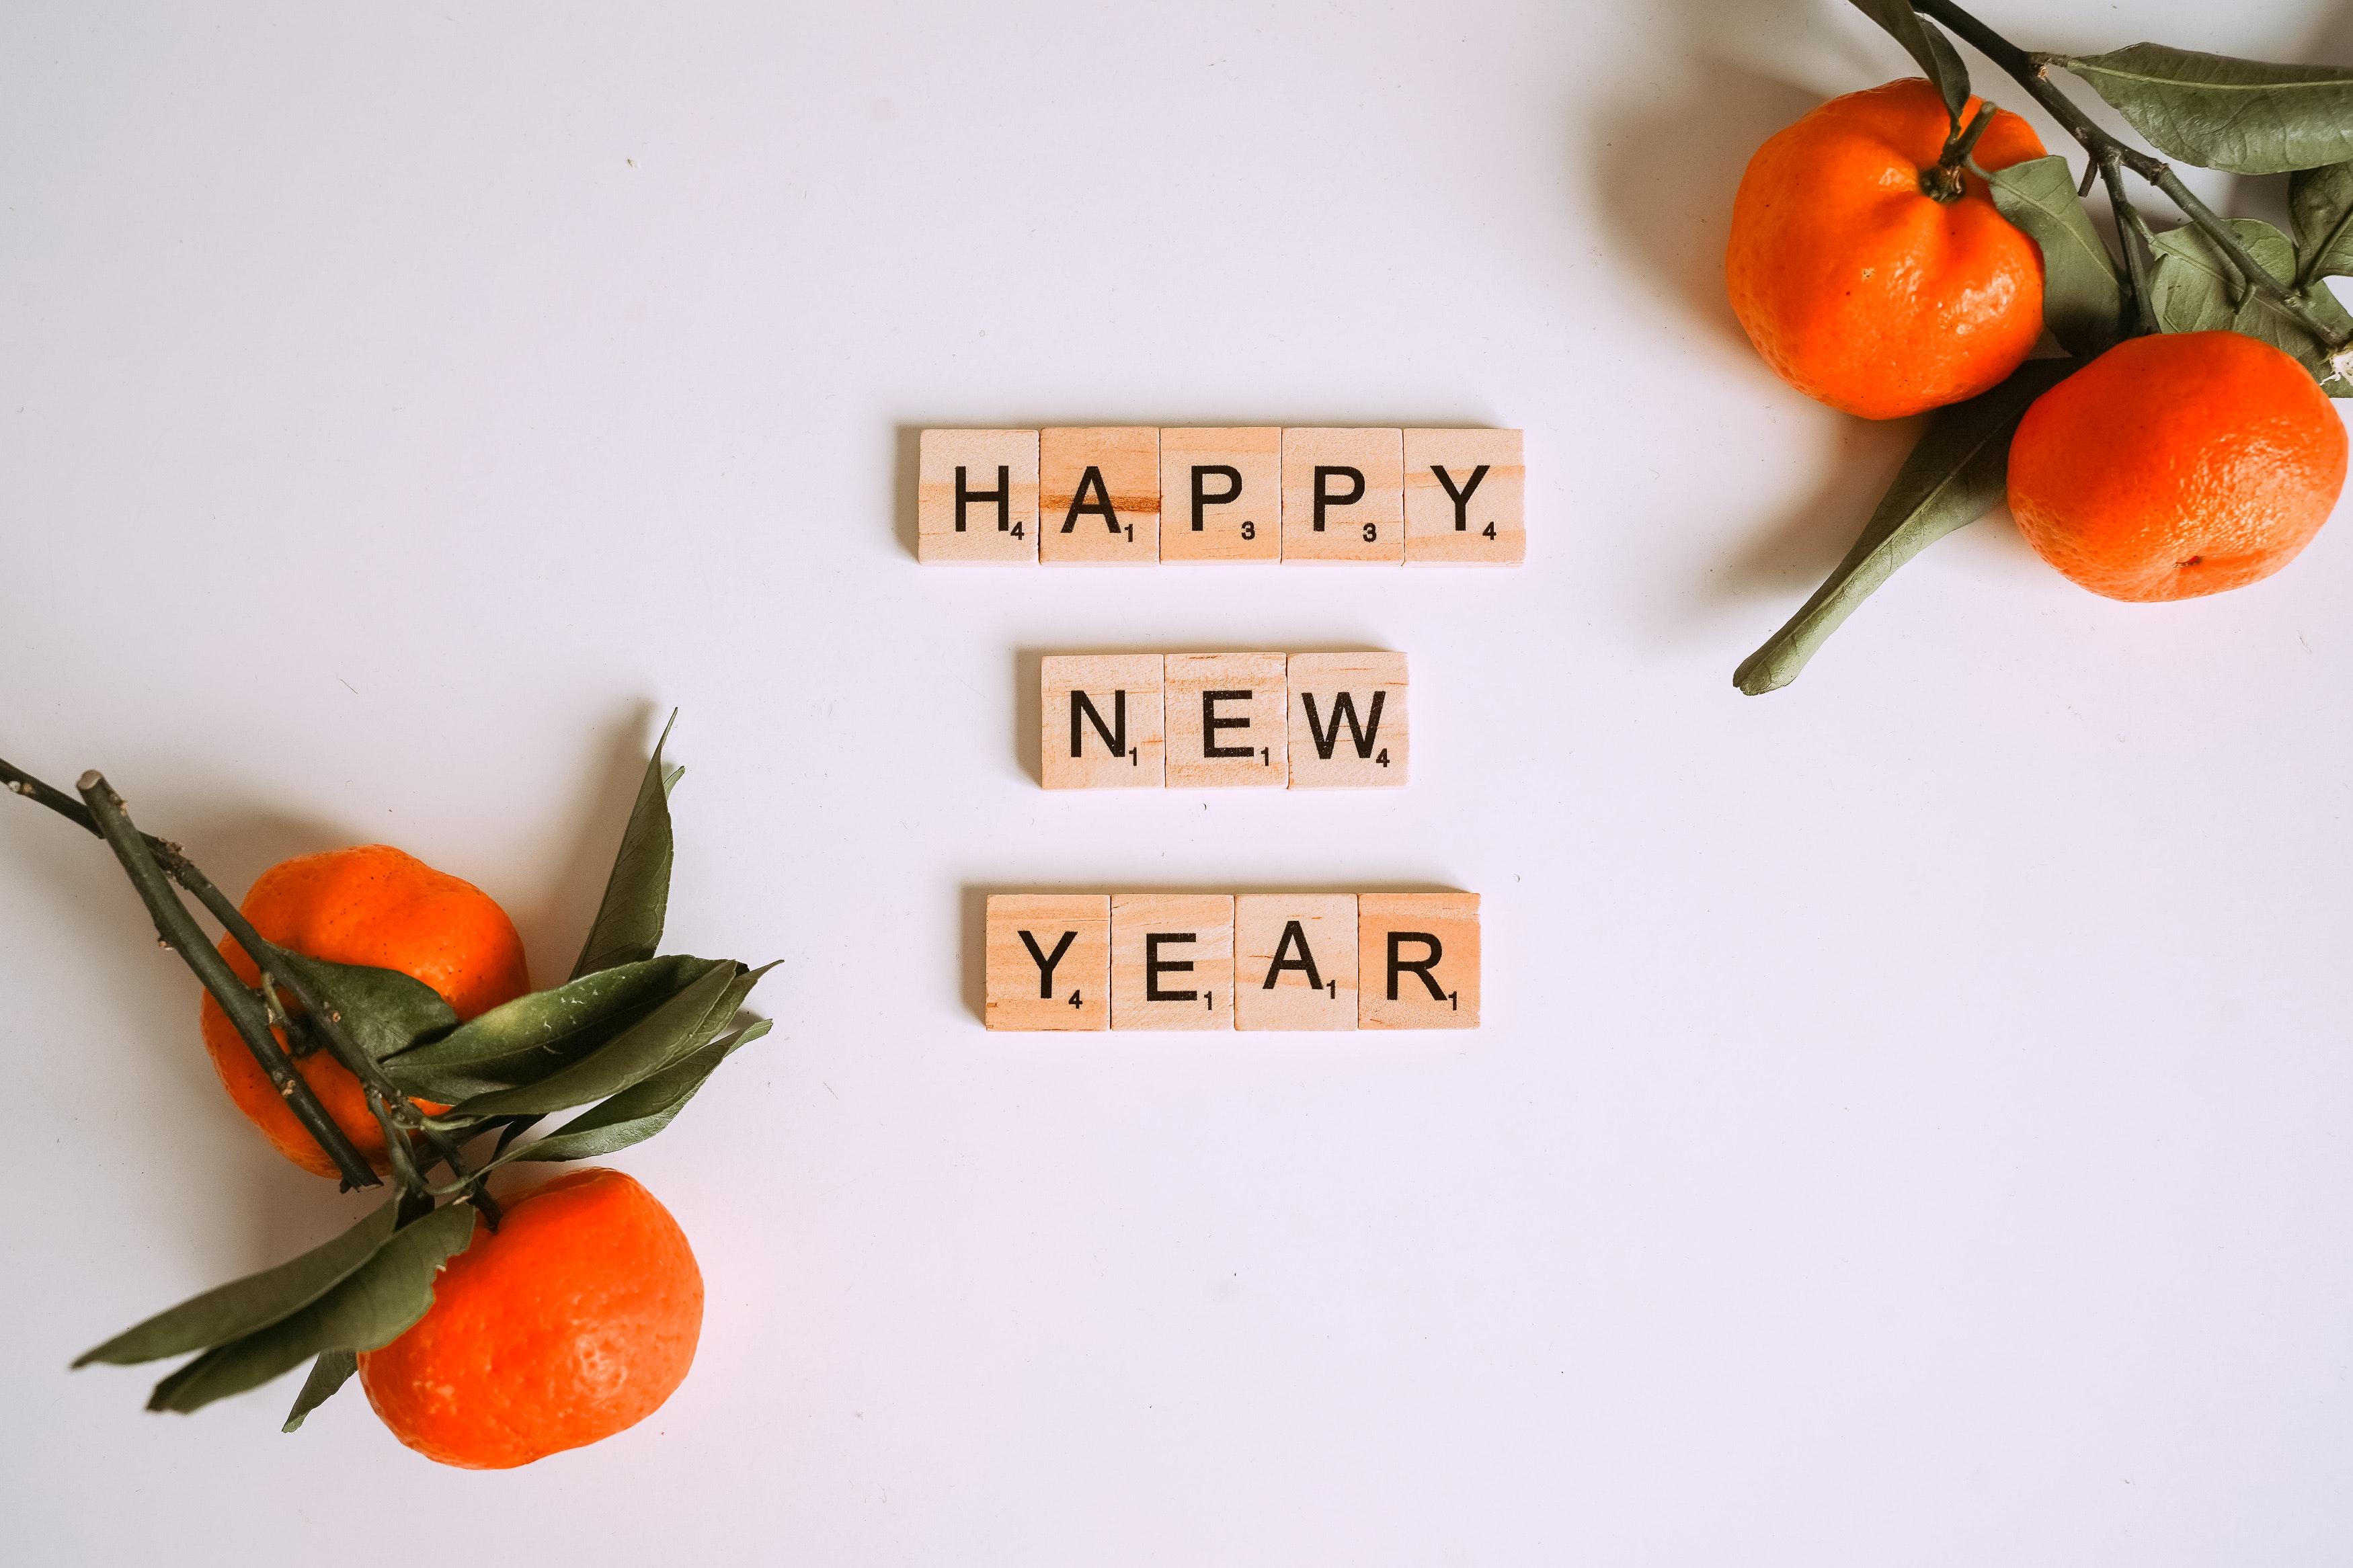 Happy New Year Scrabble tiles